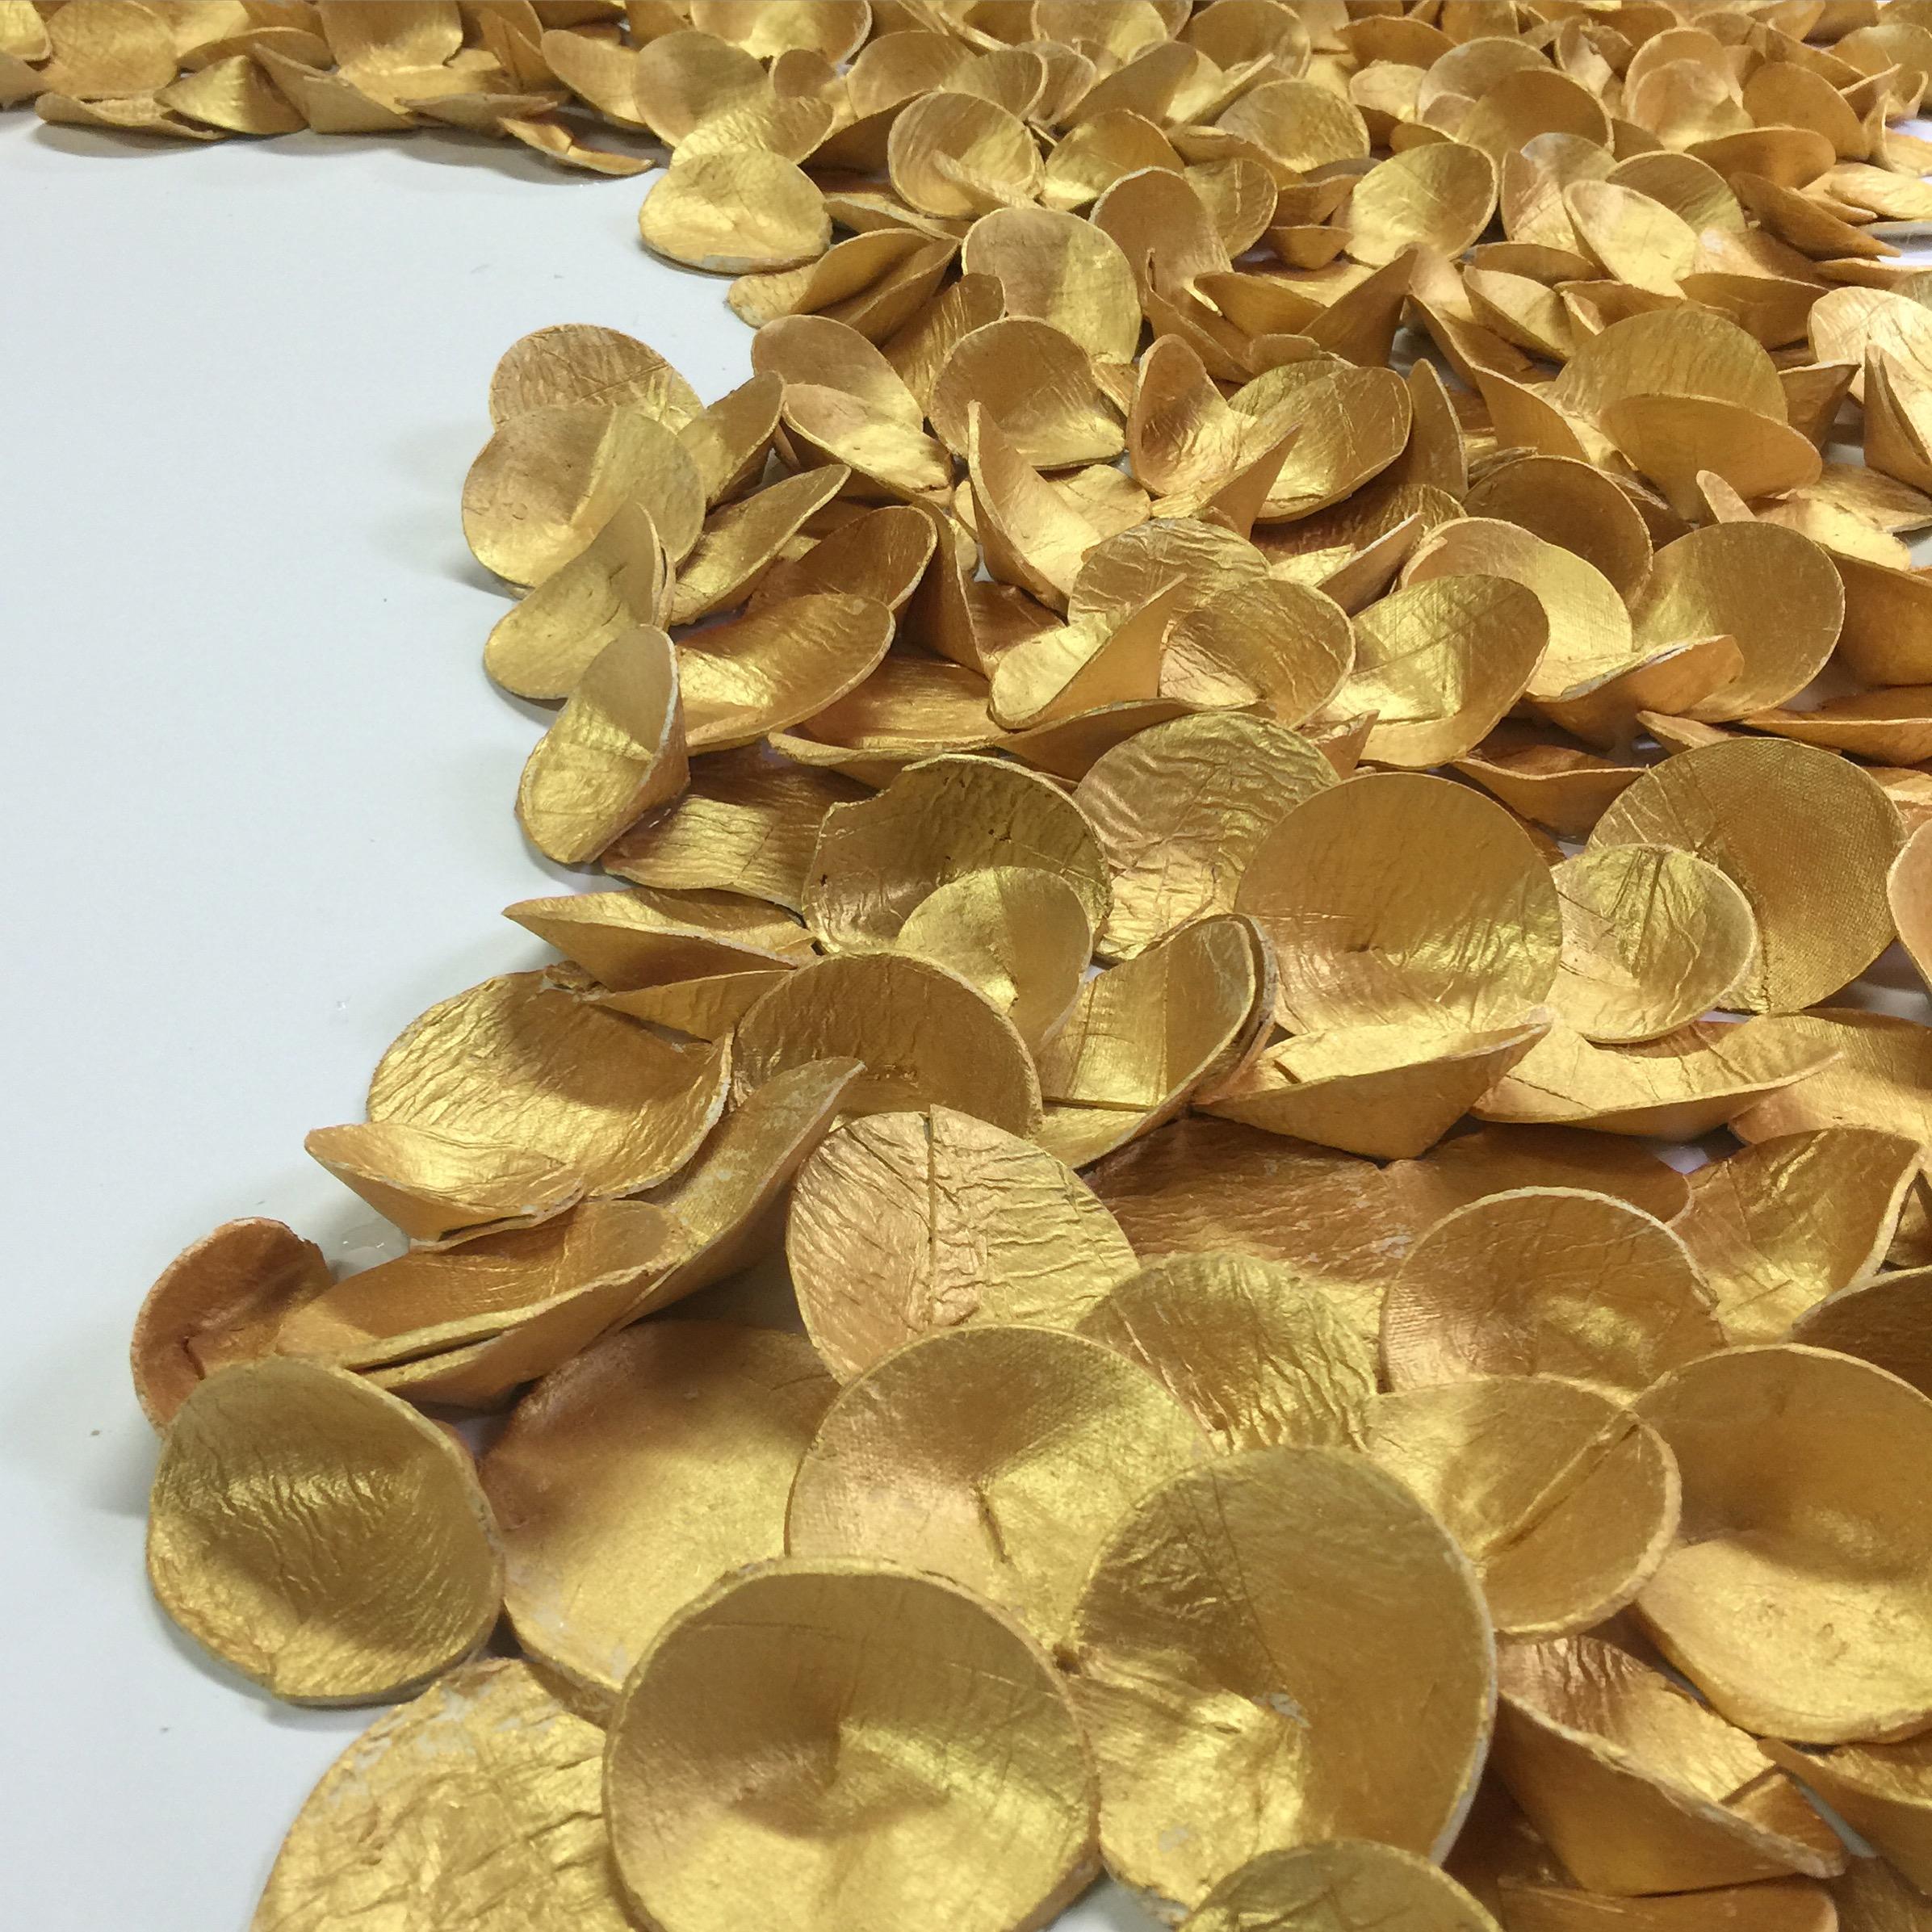 paperclay sculpture installation process .jpg